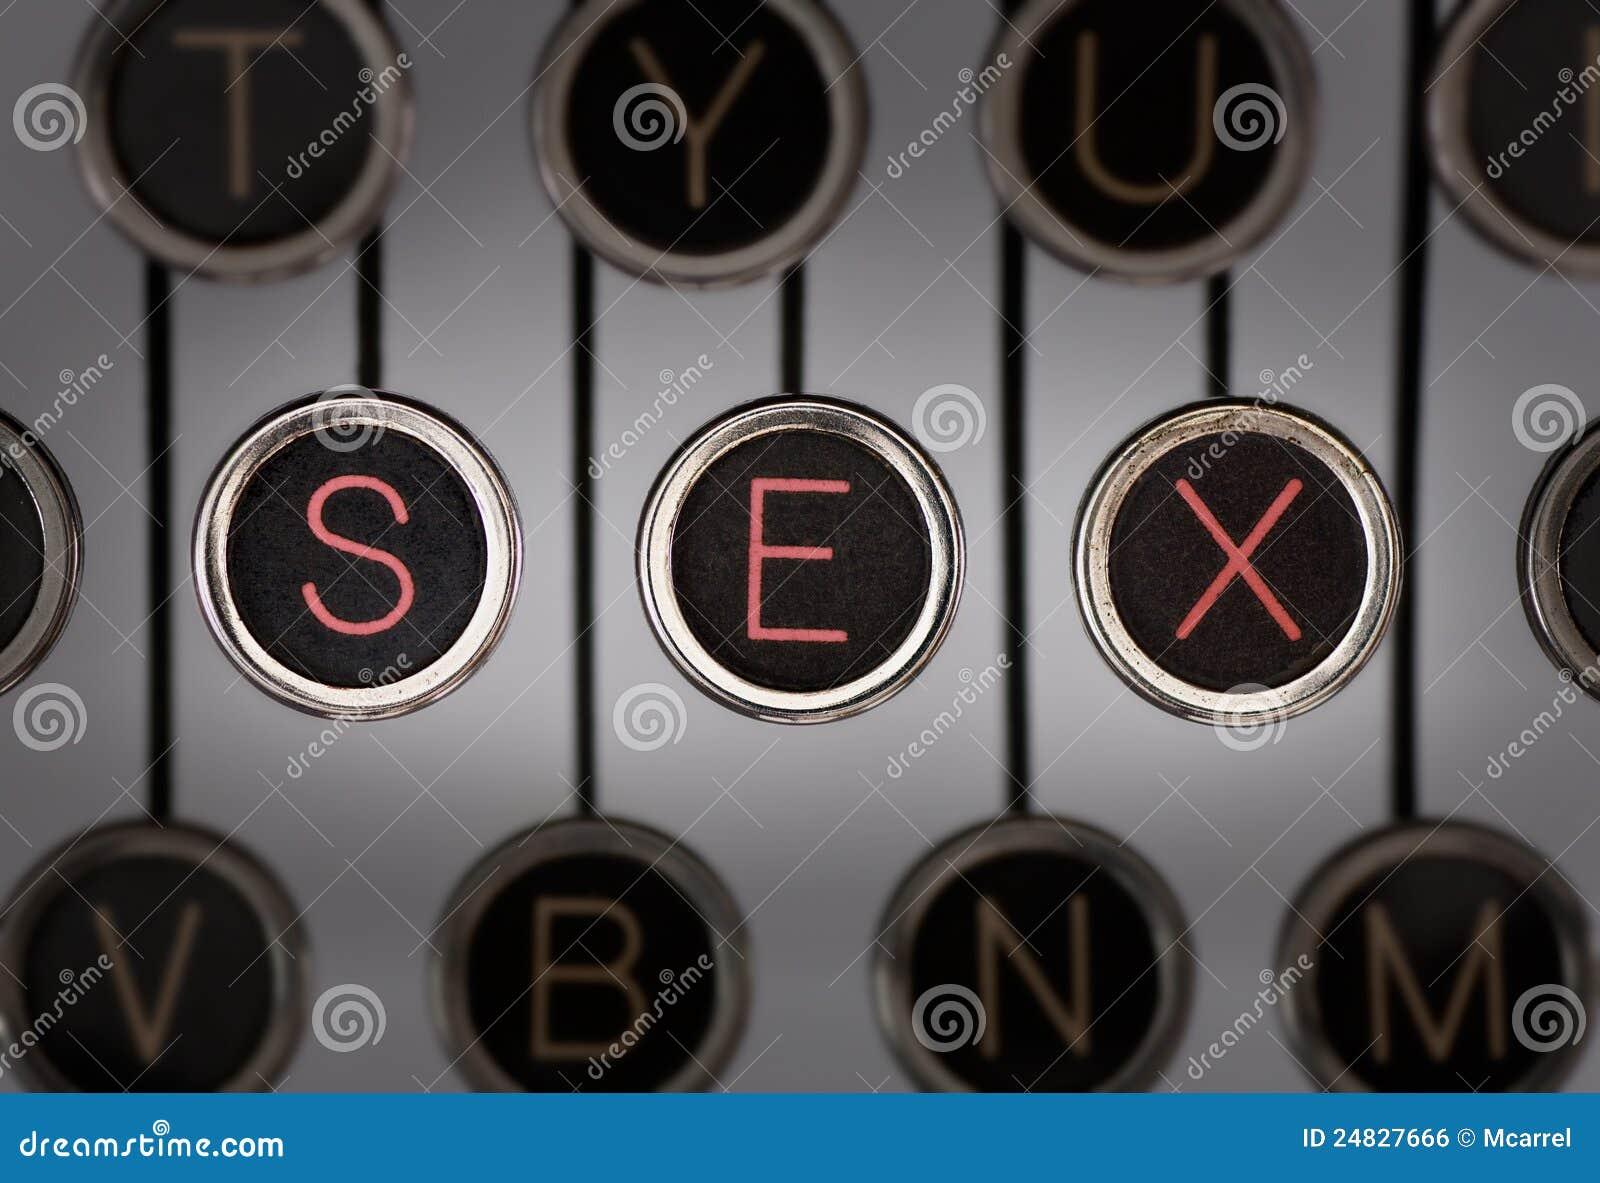 free old sex